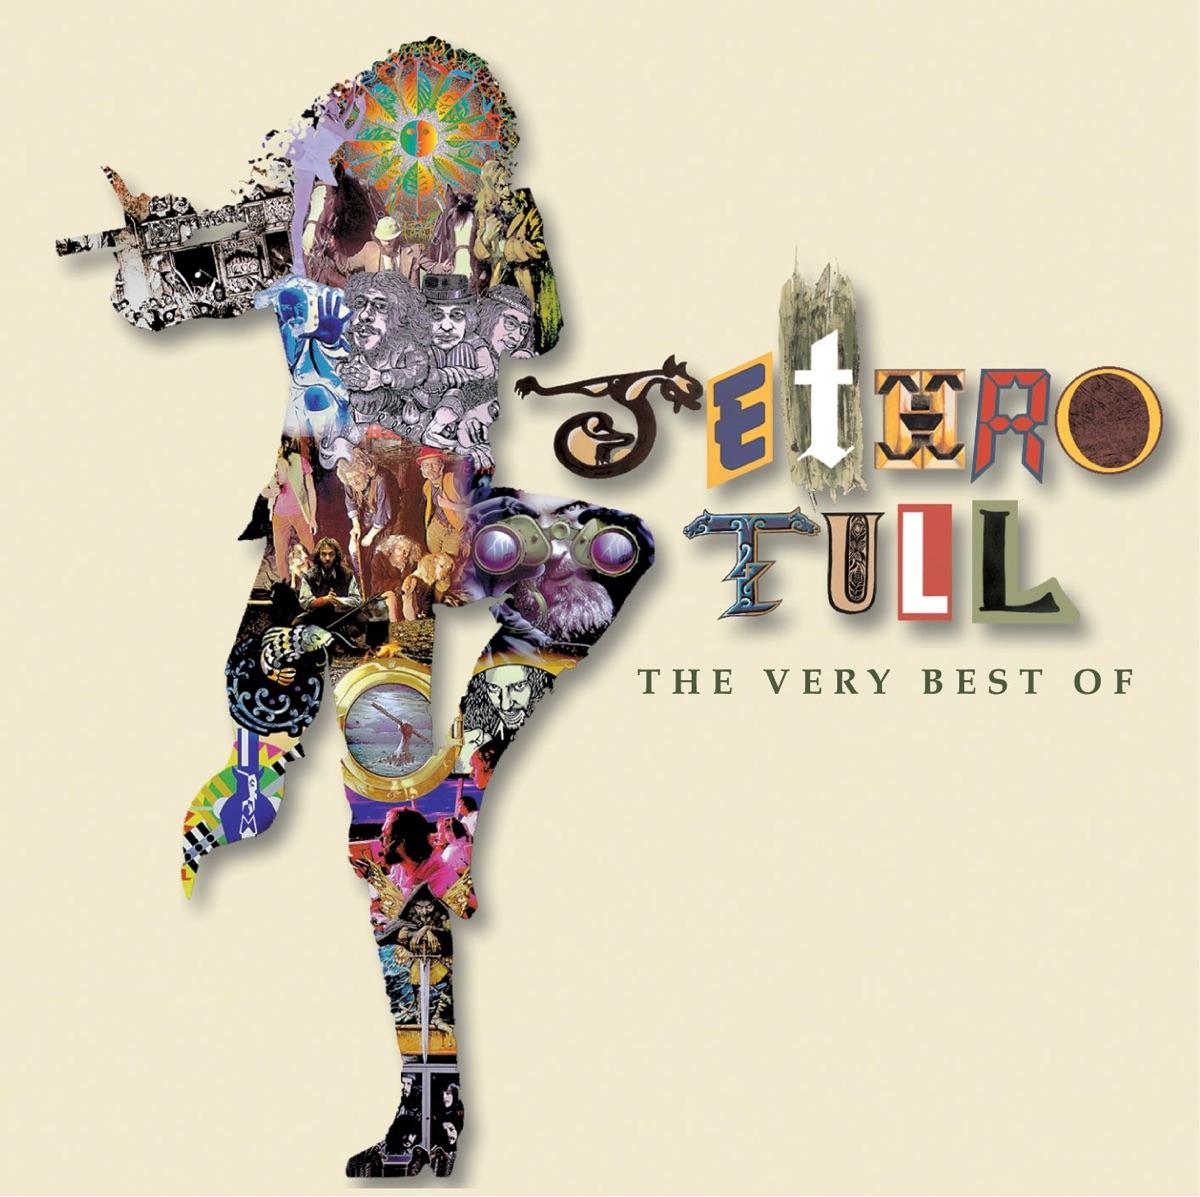 The Very Best of Jethro Tull Album Cover by Jethro Tull